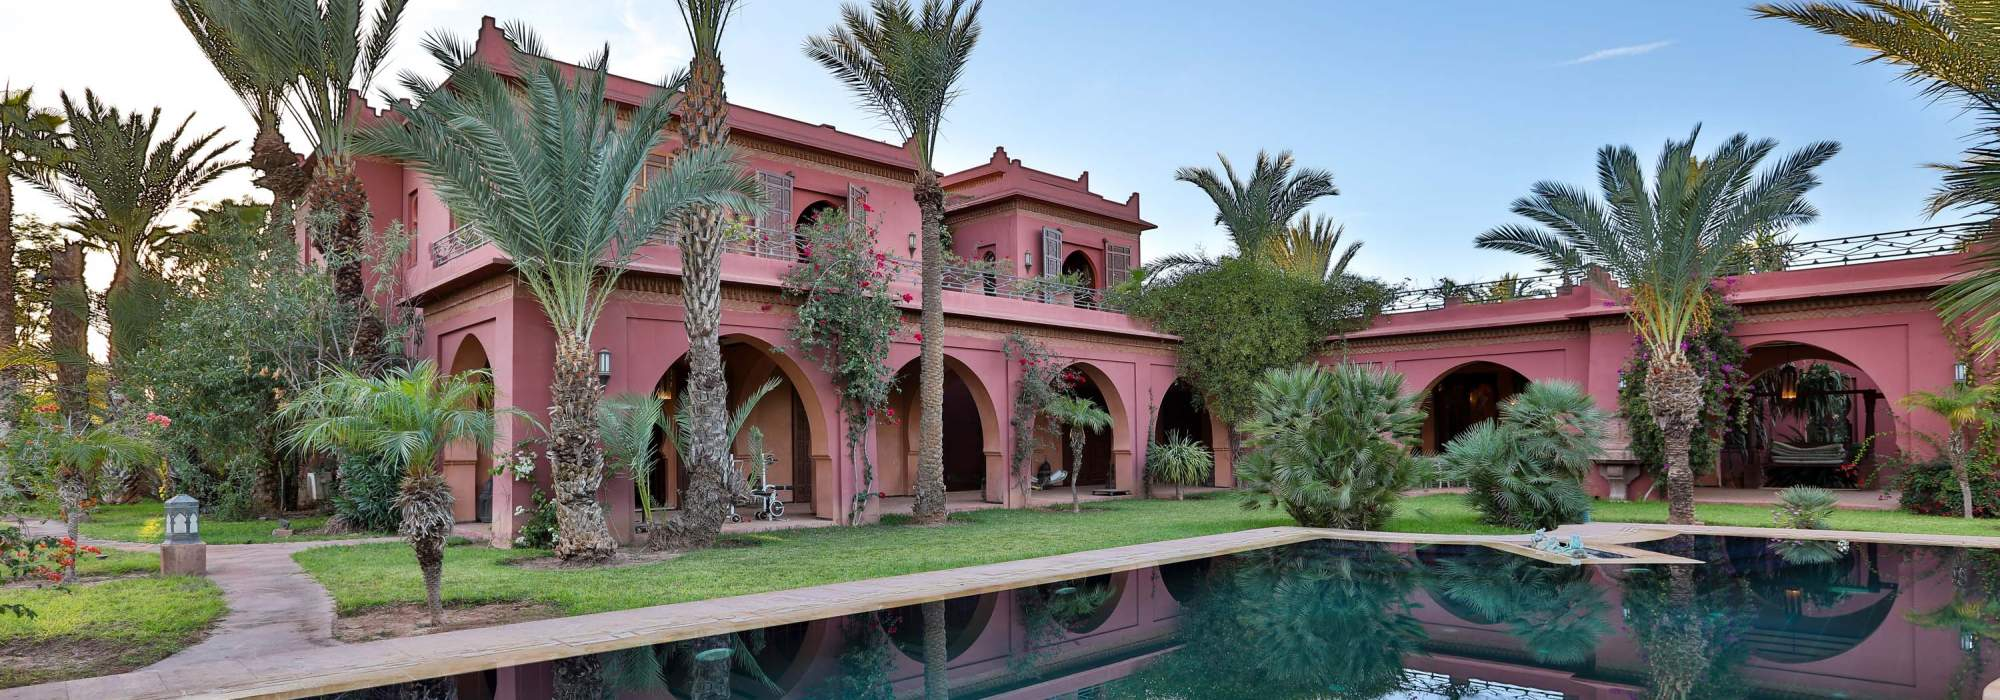 villa a vendre palmeraie marrakech